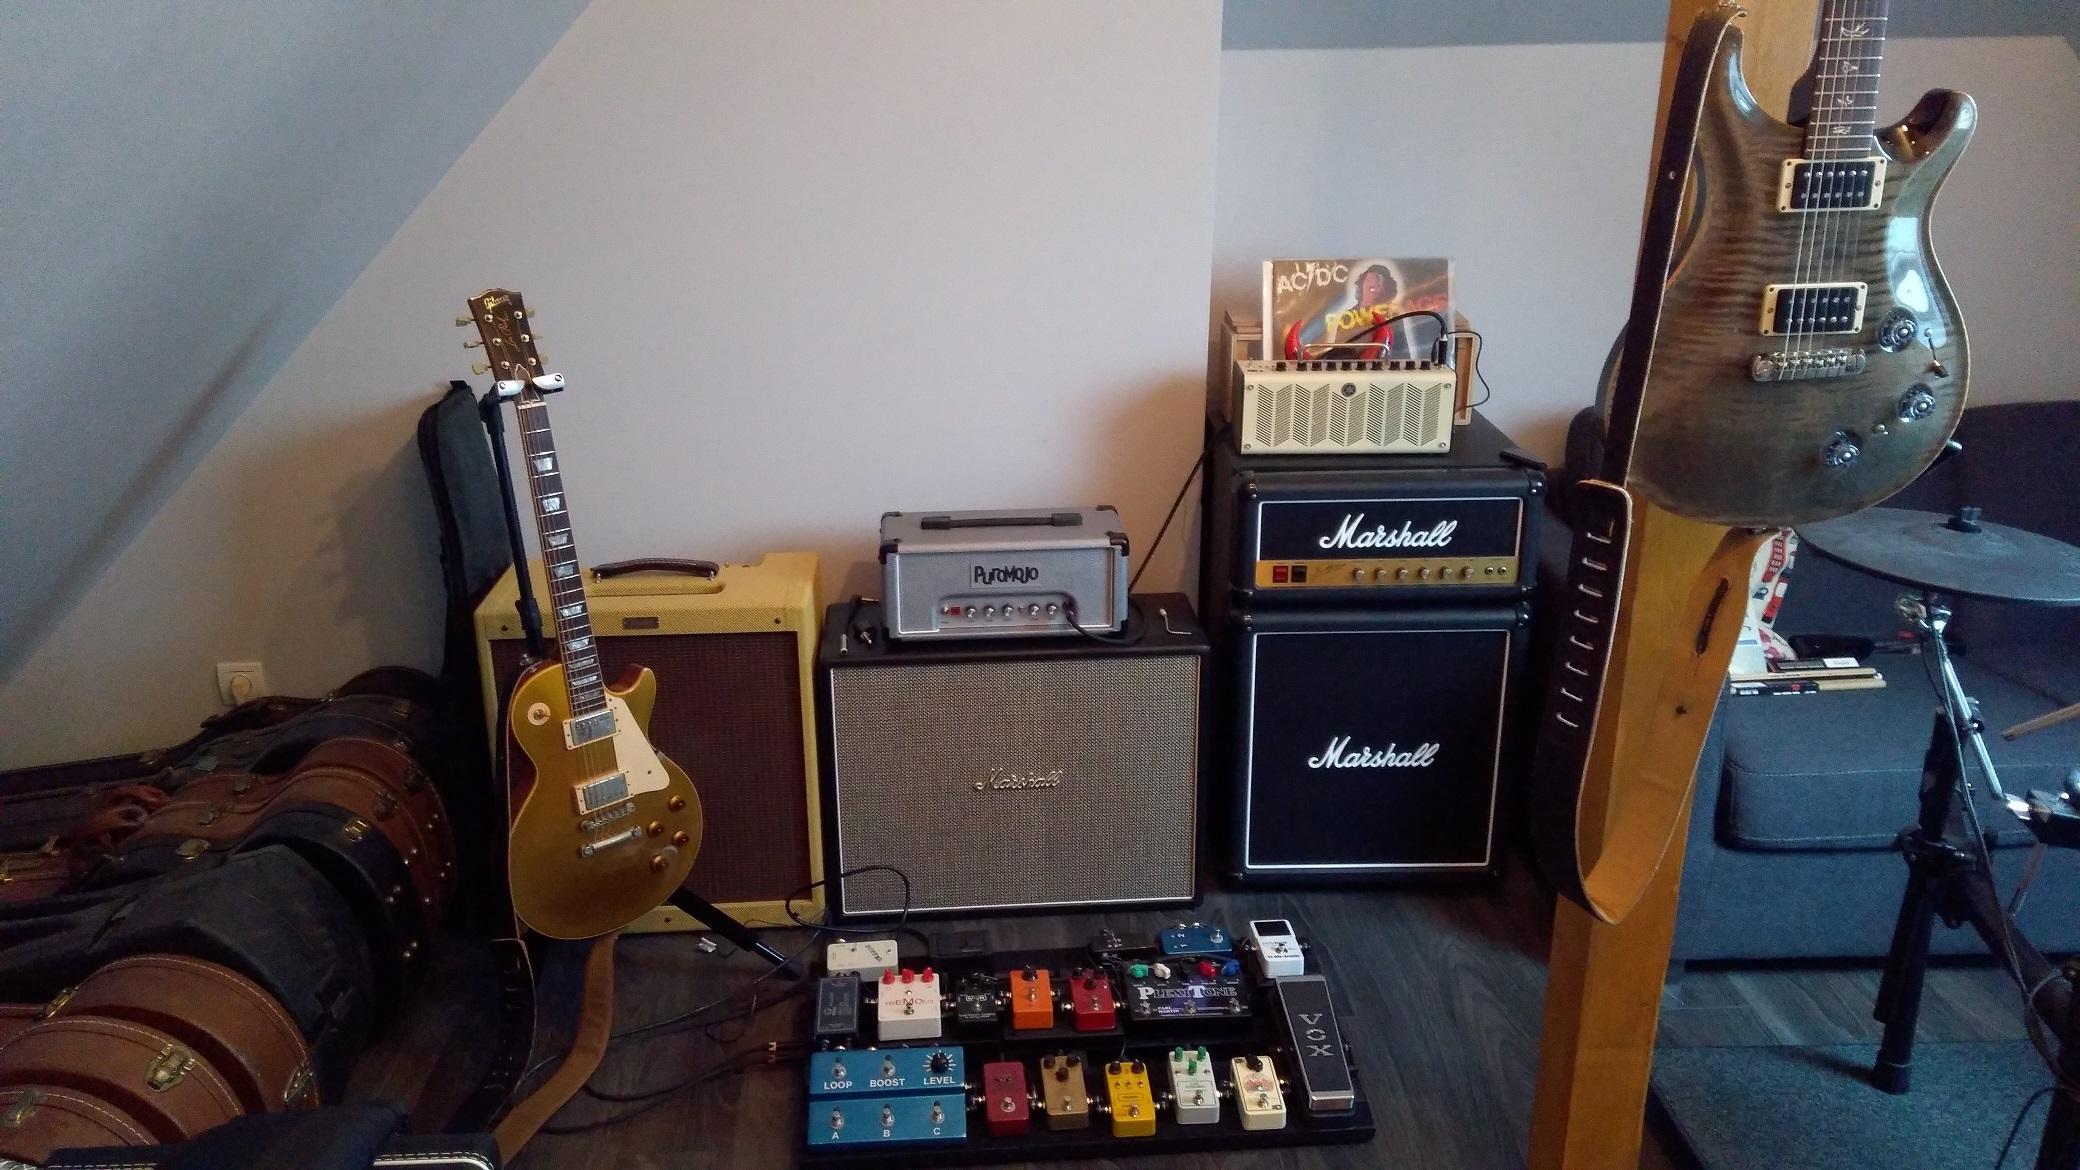 http://bamon.free.fr/Guitares/Coin_grattes/Coin_grattes_10.jpg